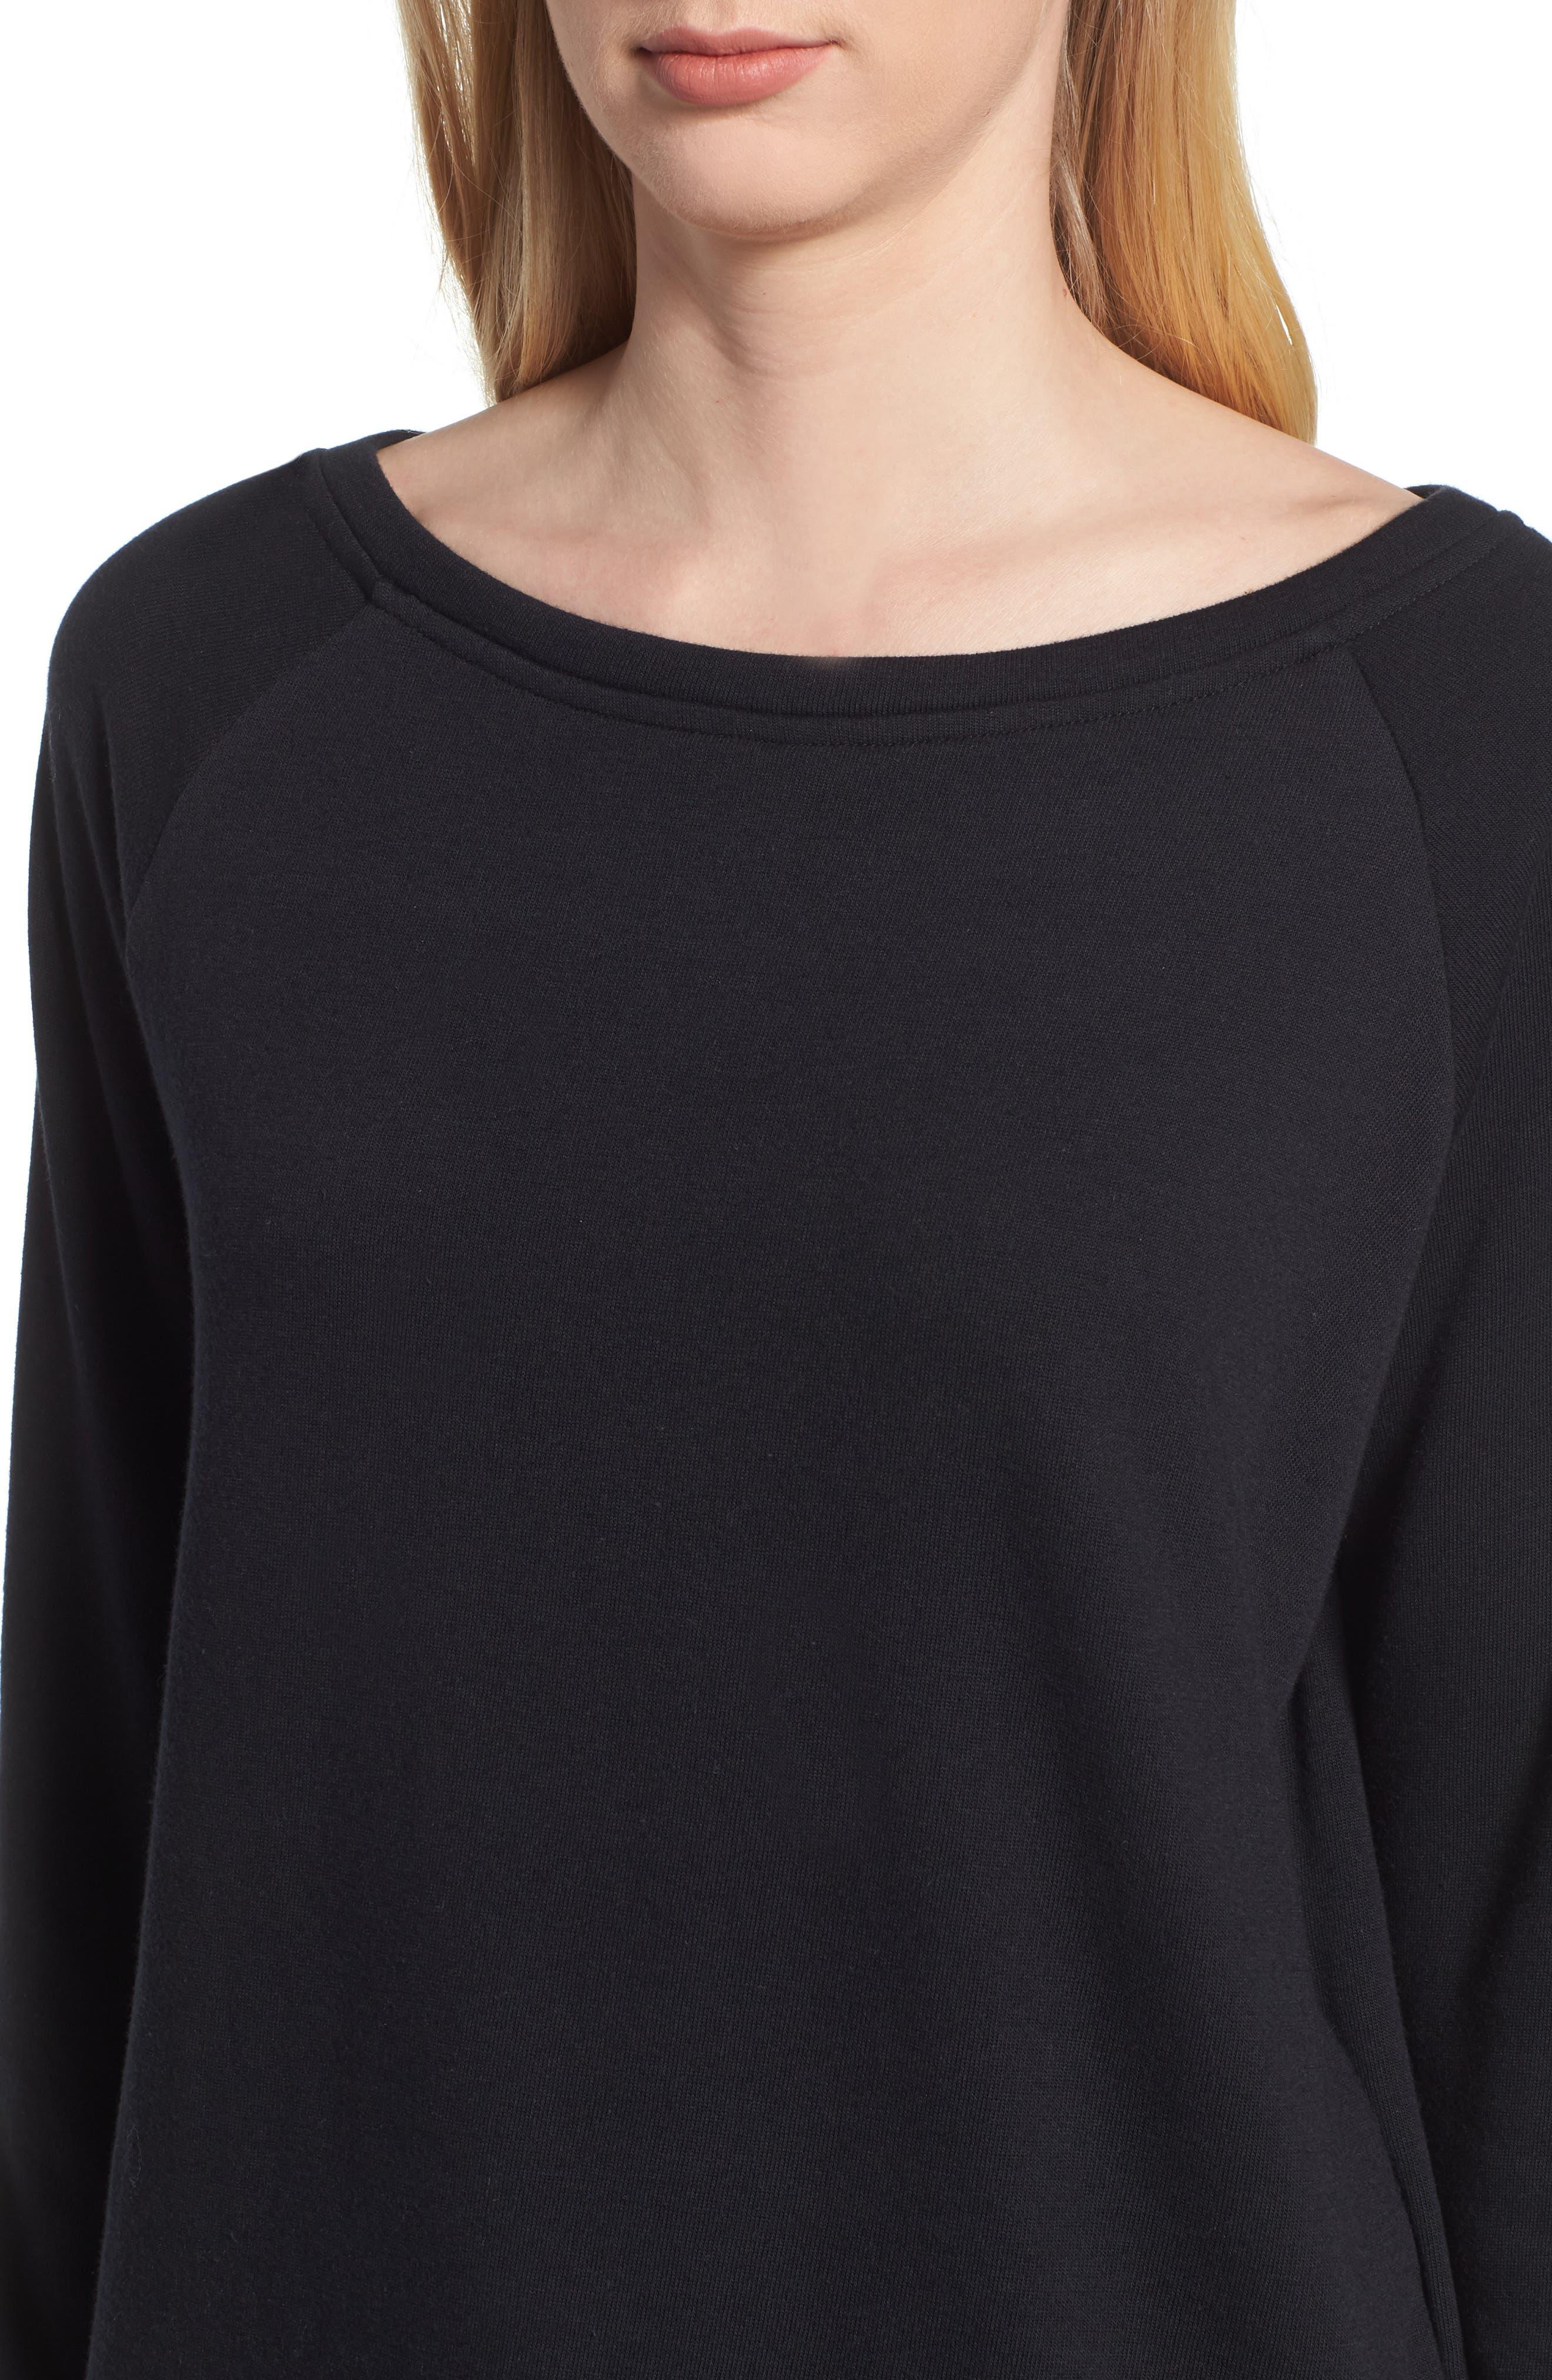 Slouch Sweatshirt,                             Alternate thumbnail 4, color,                             BLACK